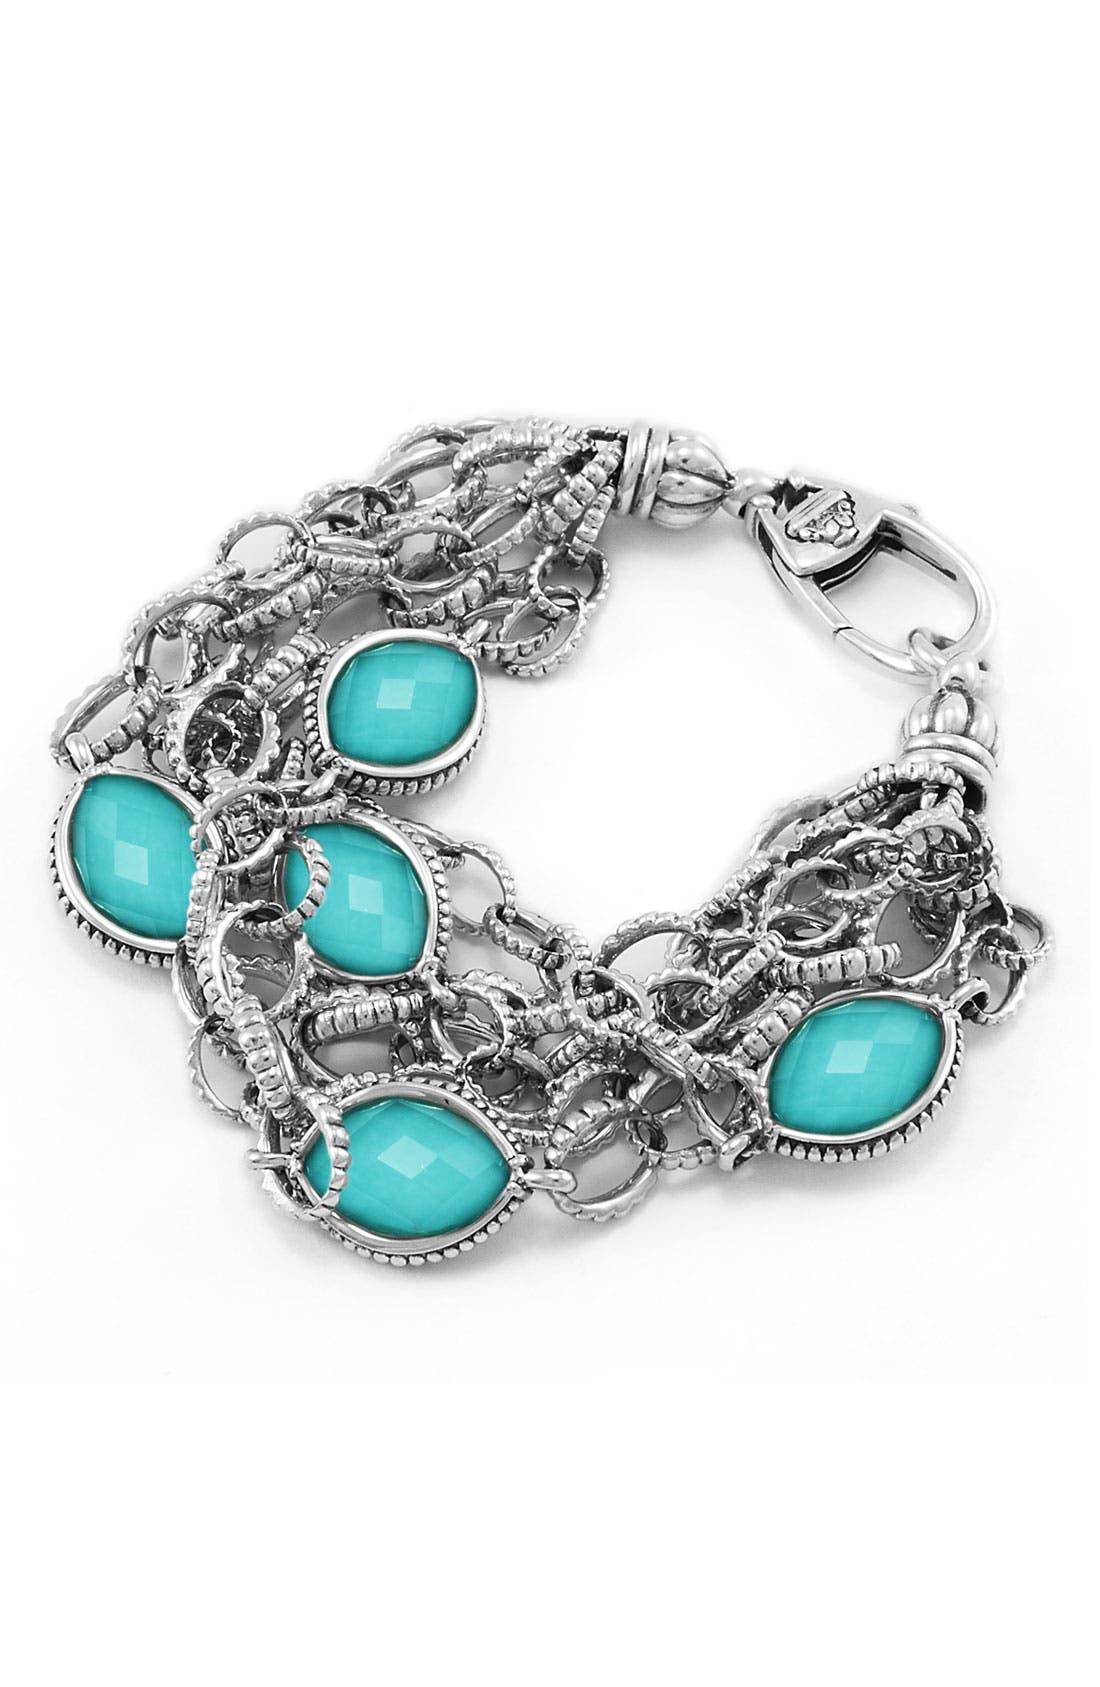 Main Image - Lagos Chain Link Bracelet